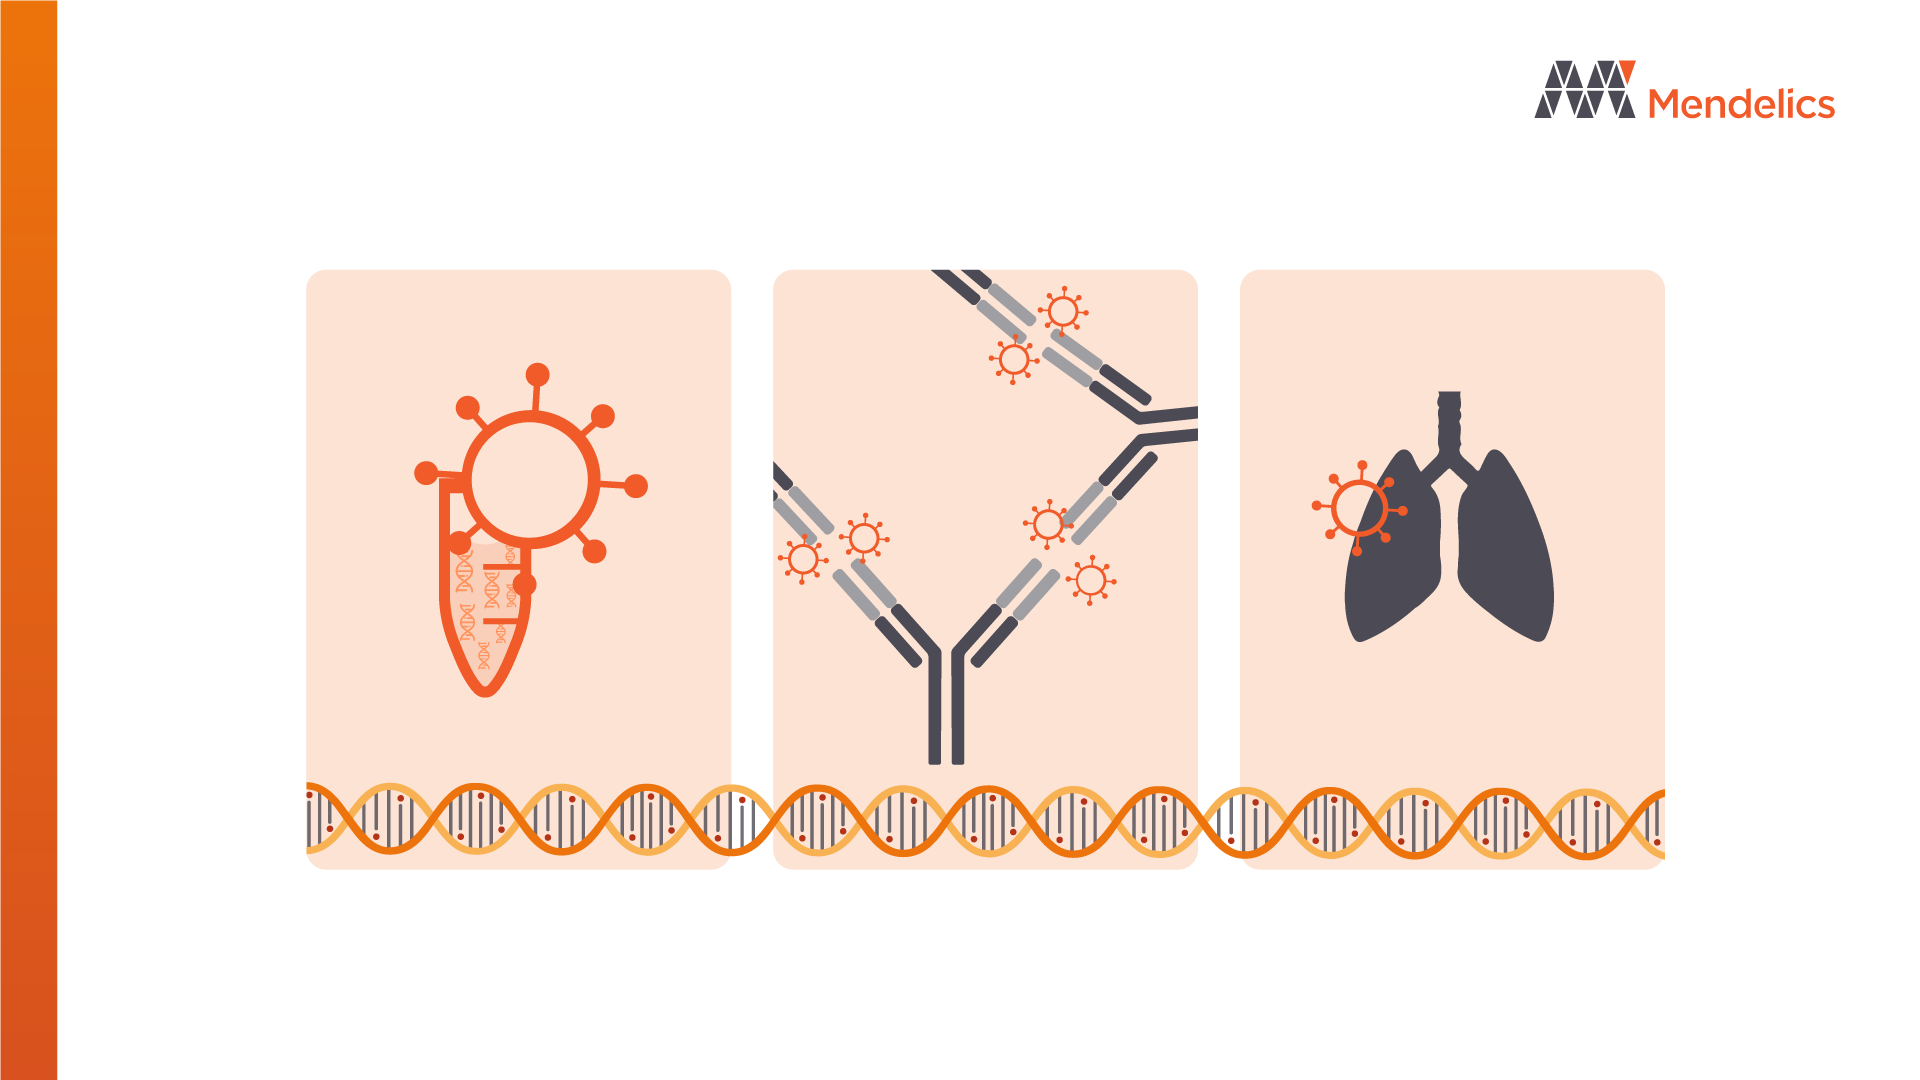 covid-19 sars-cov-2 coronavirus gravidade genetica mecanismo genetico